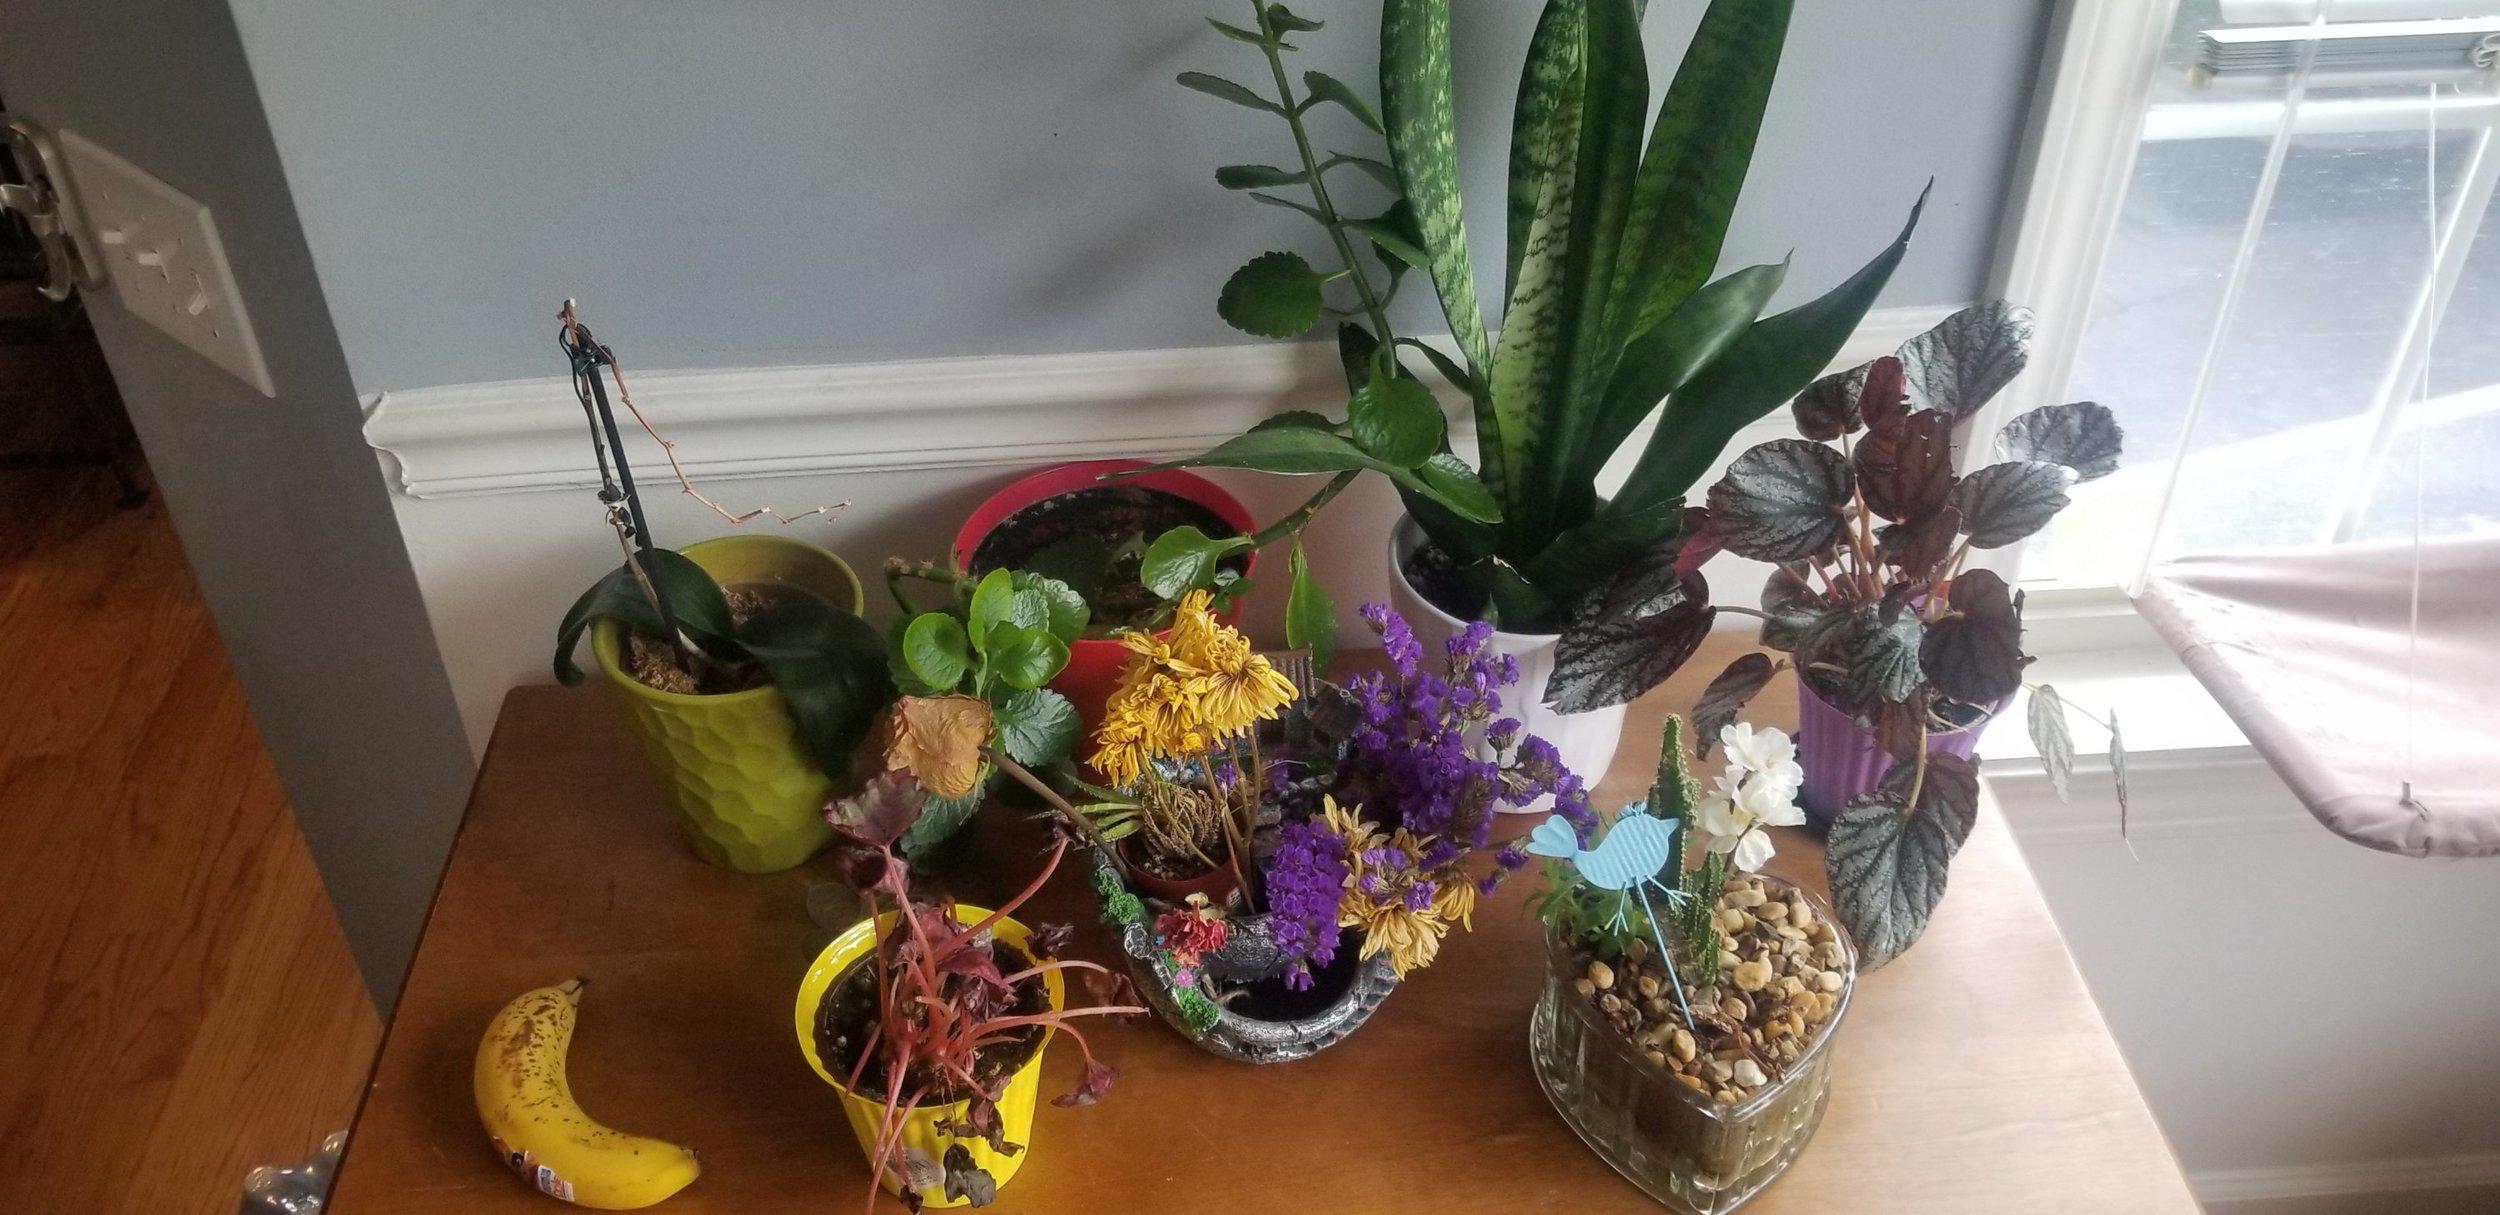 Plants arranged and banana yum